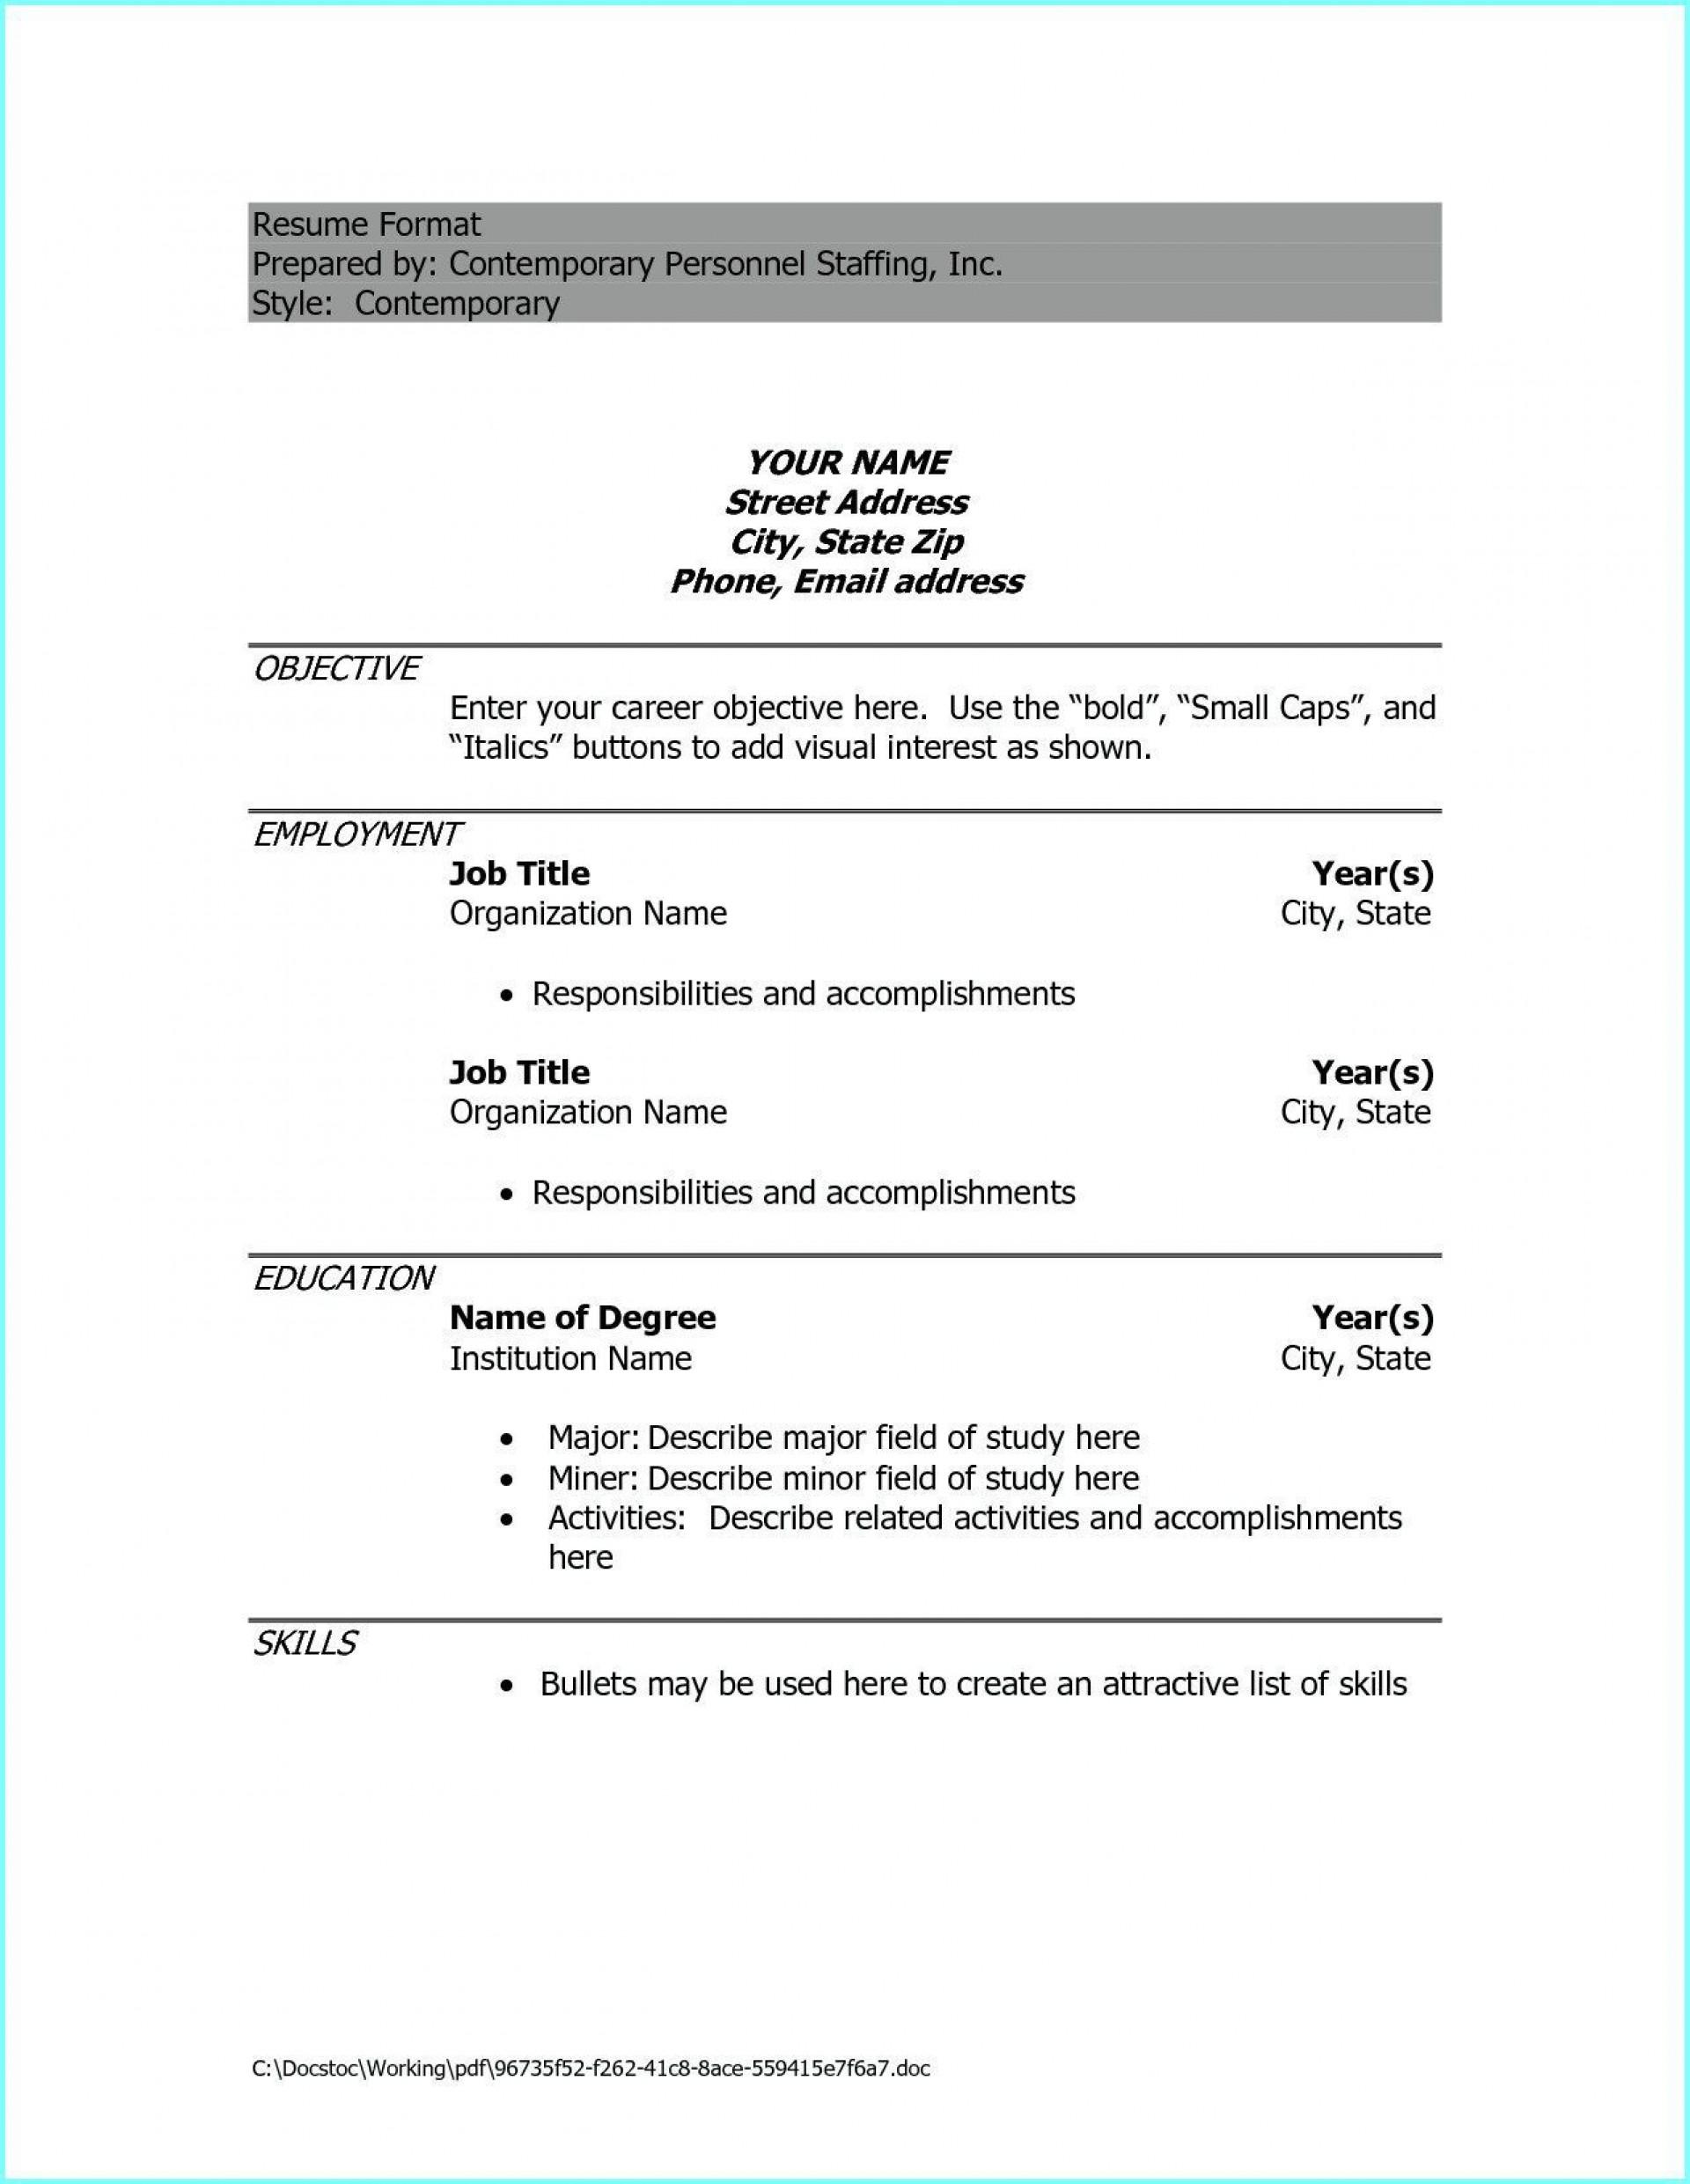 009 Phenomenal Resume Example Pdf Free Download 1920